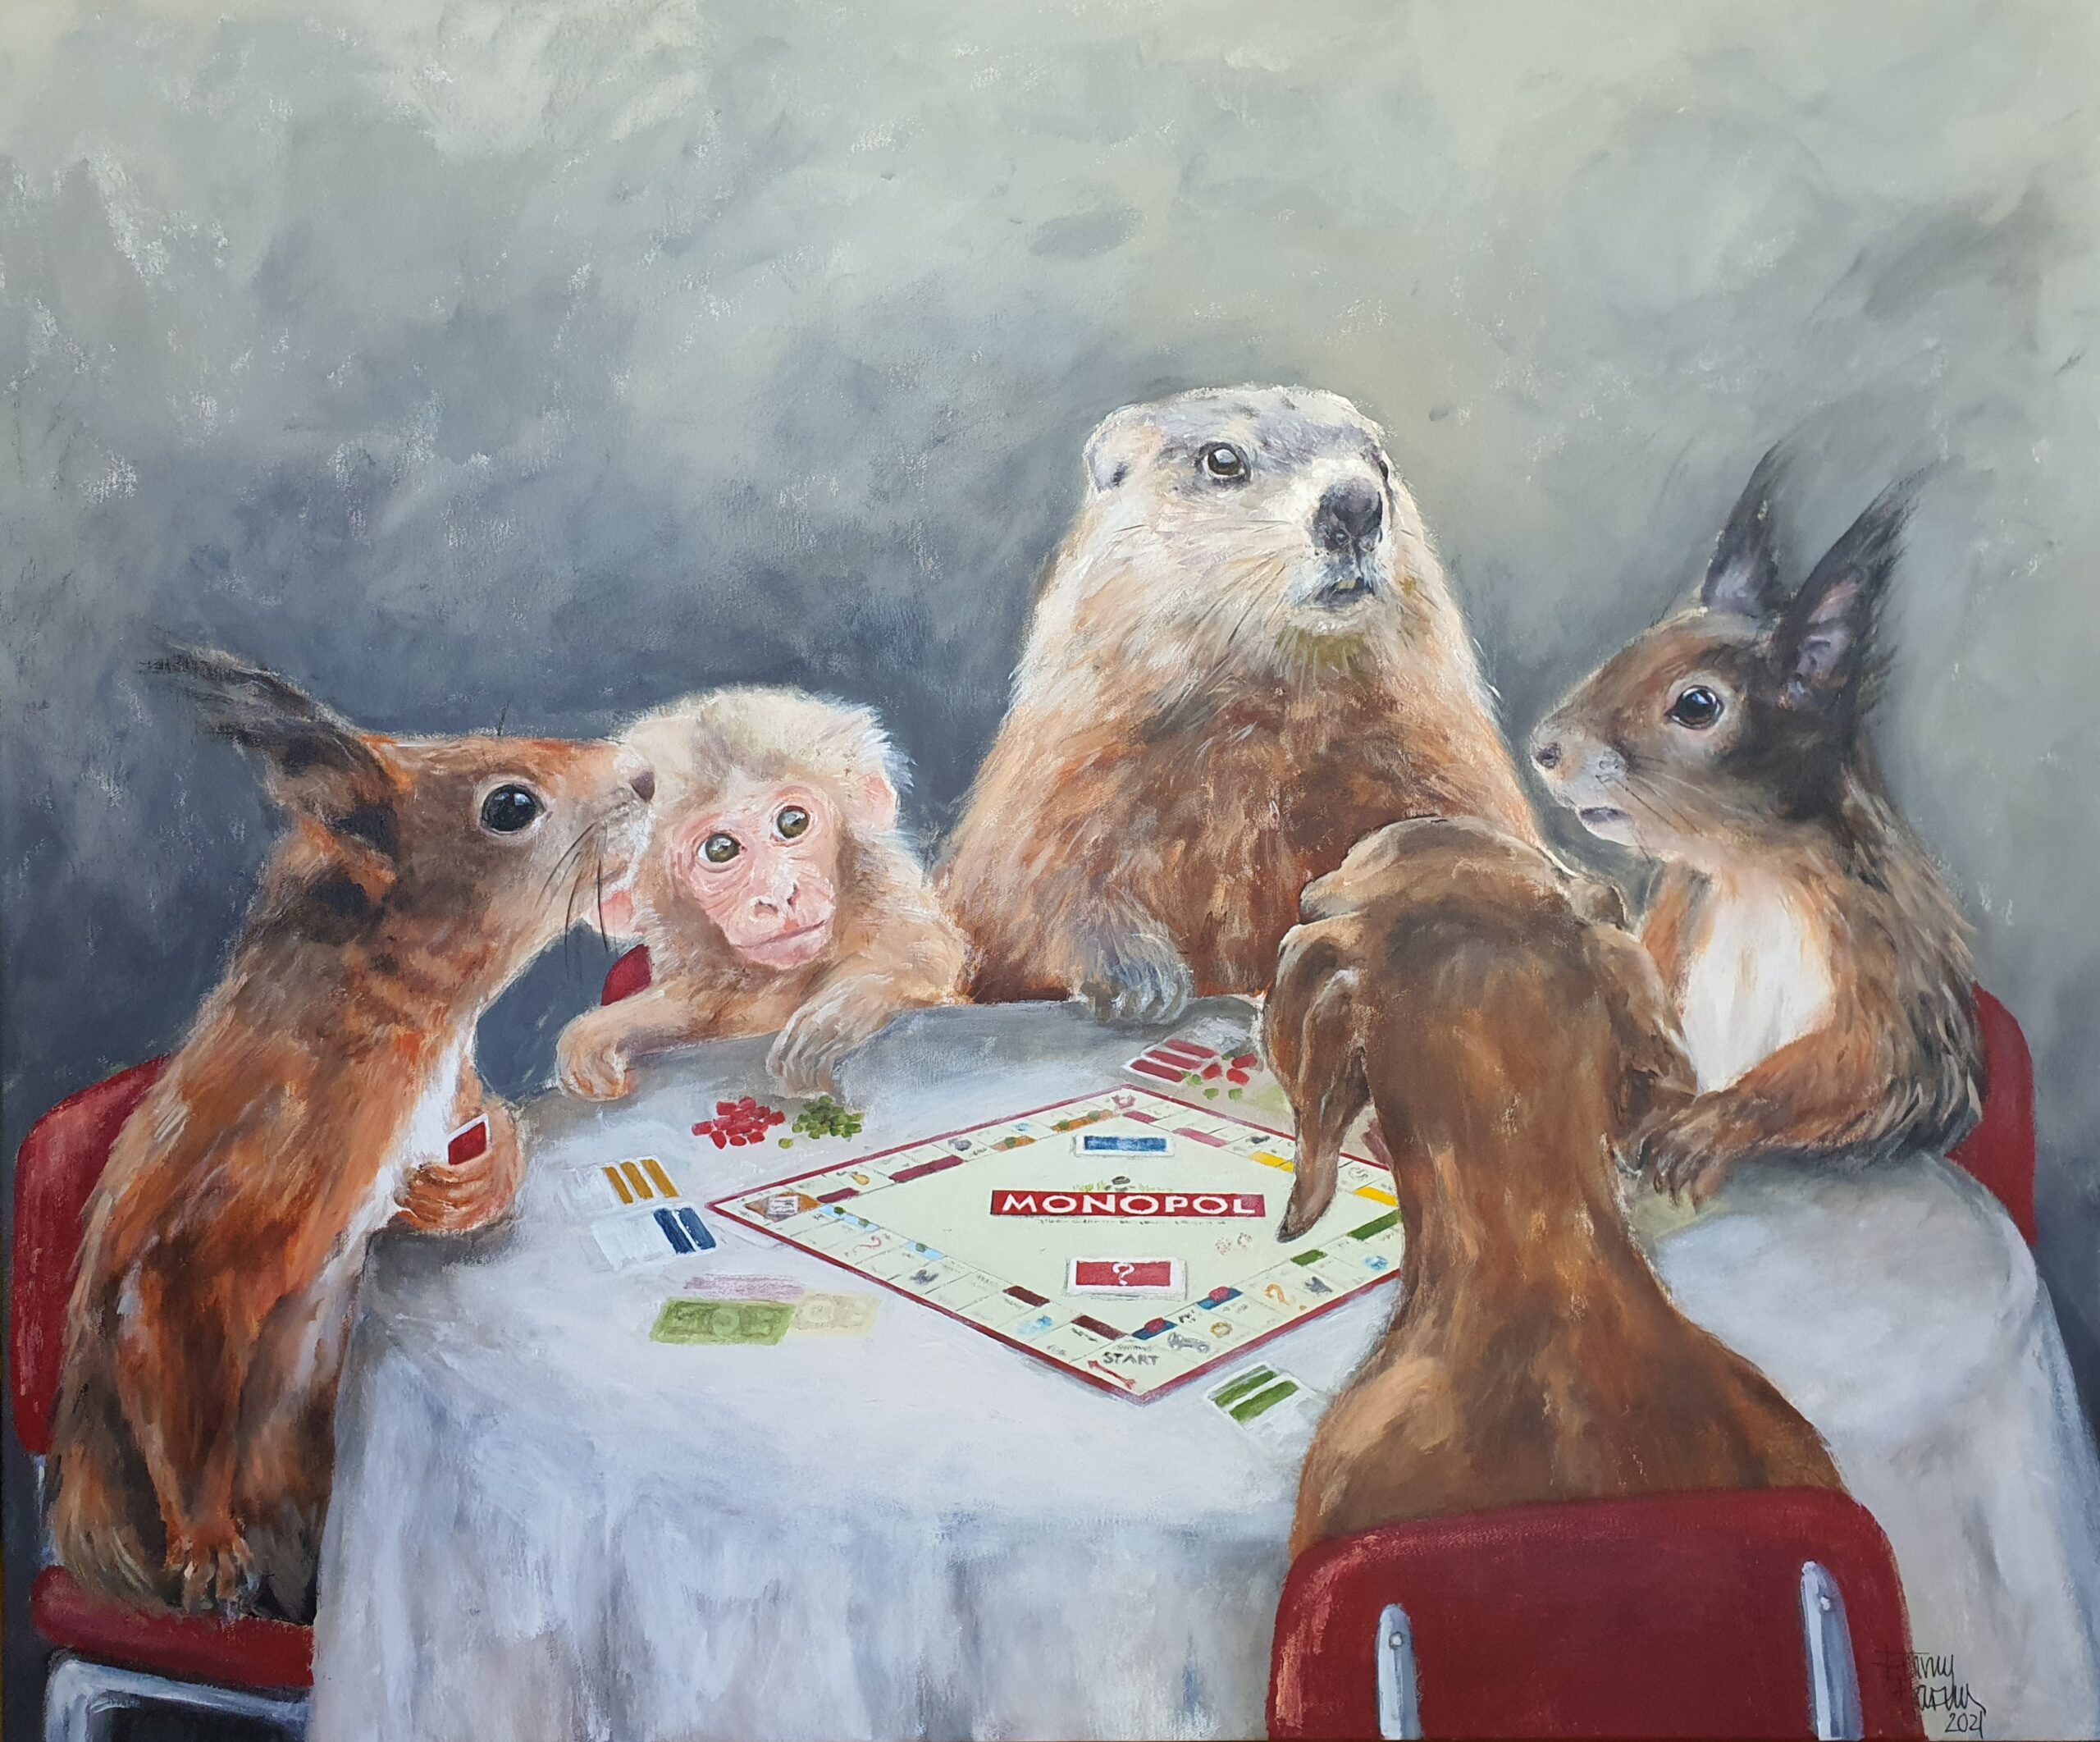 Emmy Harnes billedkunstner billedkunst Haslum Bærum kunstner figurativ kunst antropomorfisk eventyrlig artist art anthropomorphicart